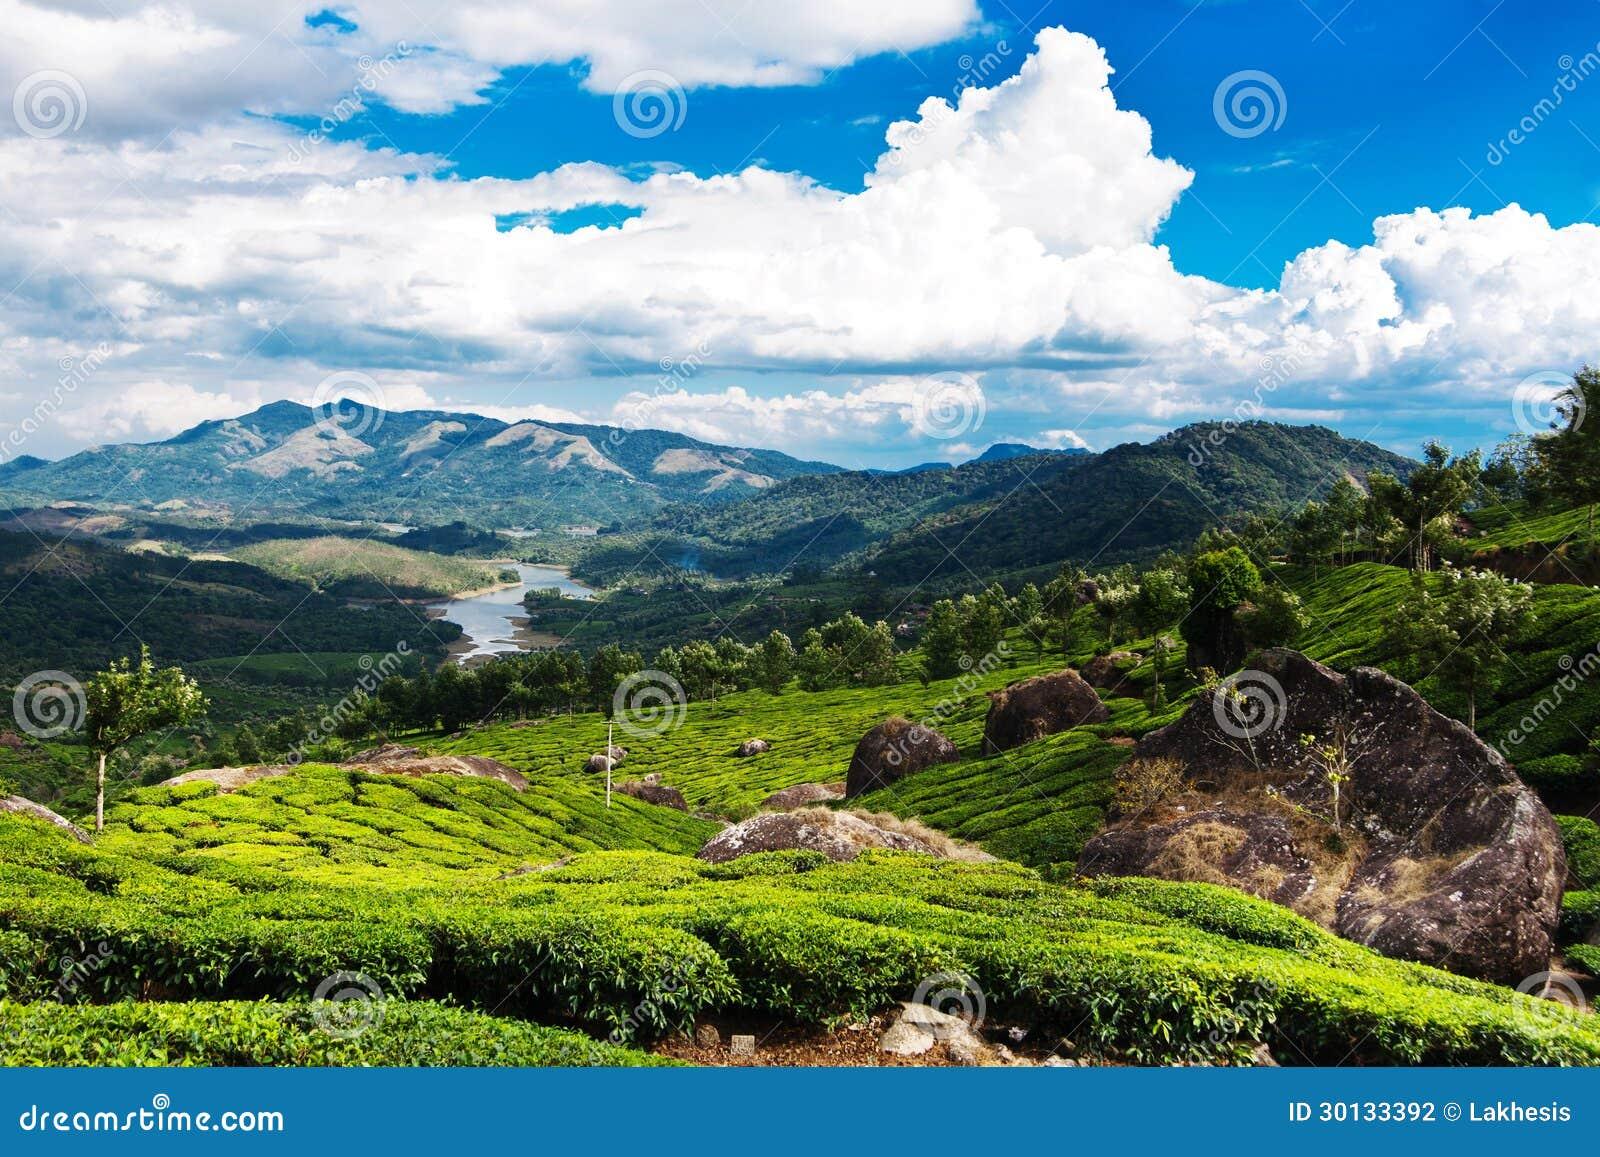 Tea plantation landscape under blue cloudy sky. Munnar, Kerala, India.